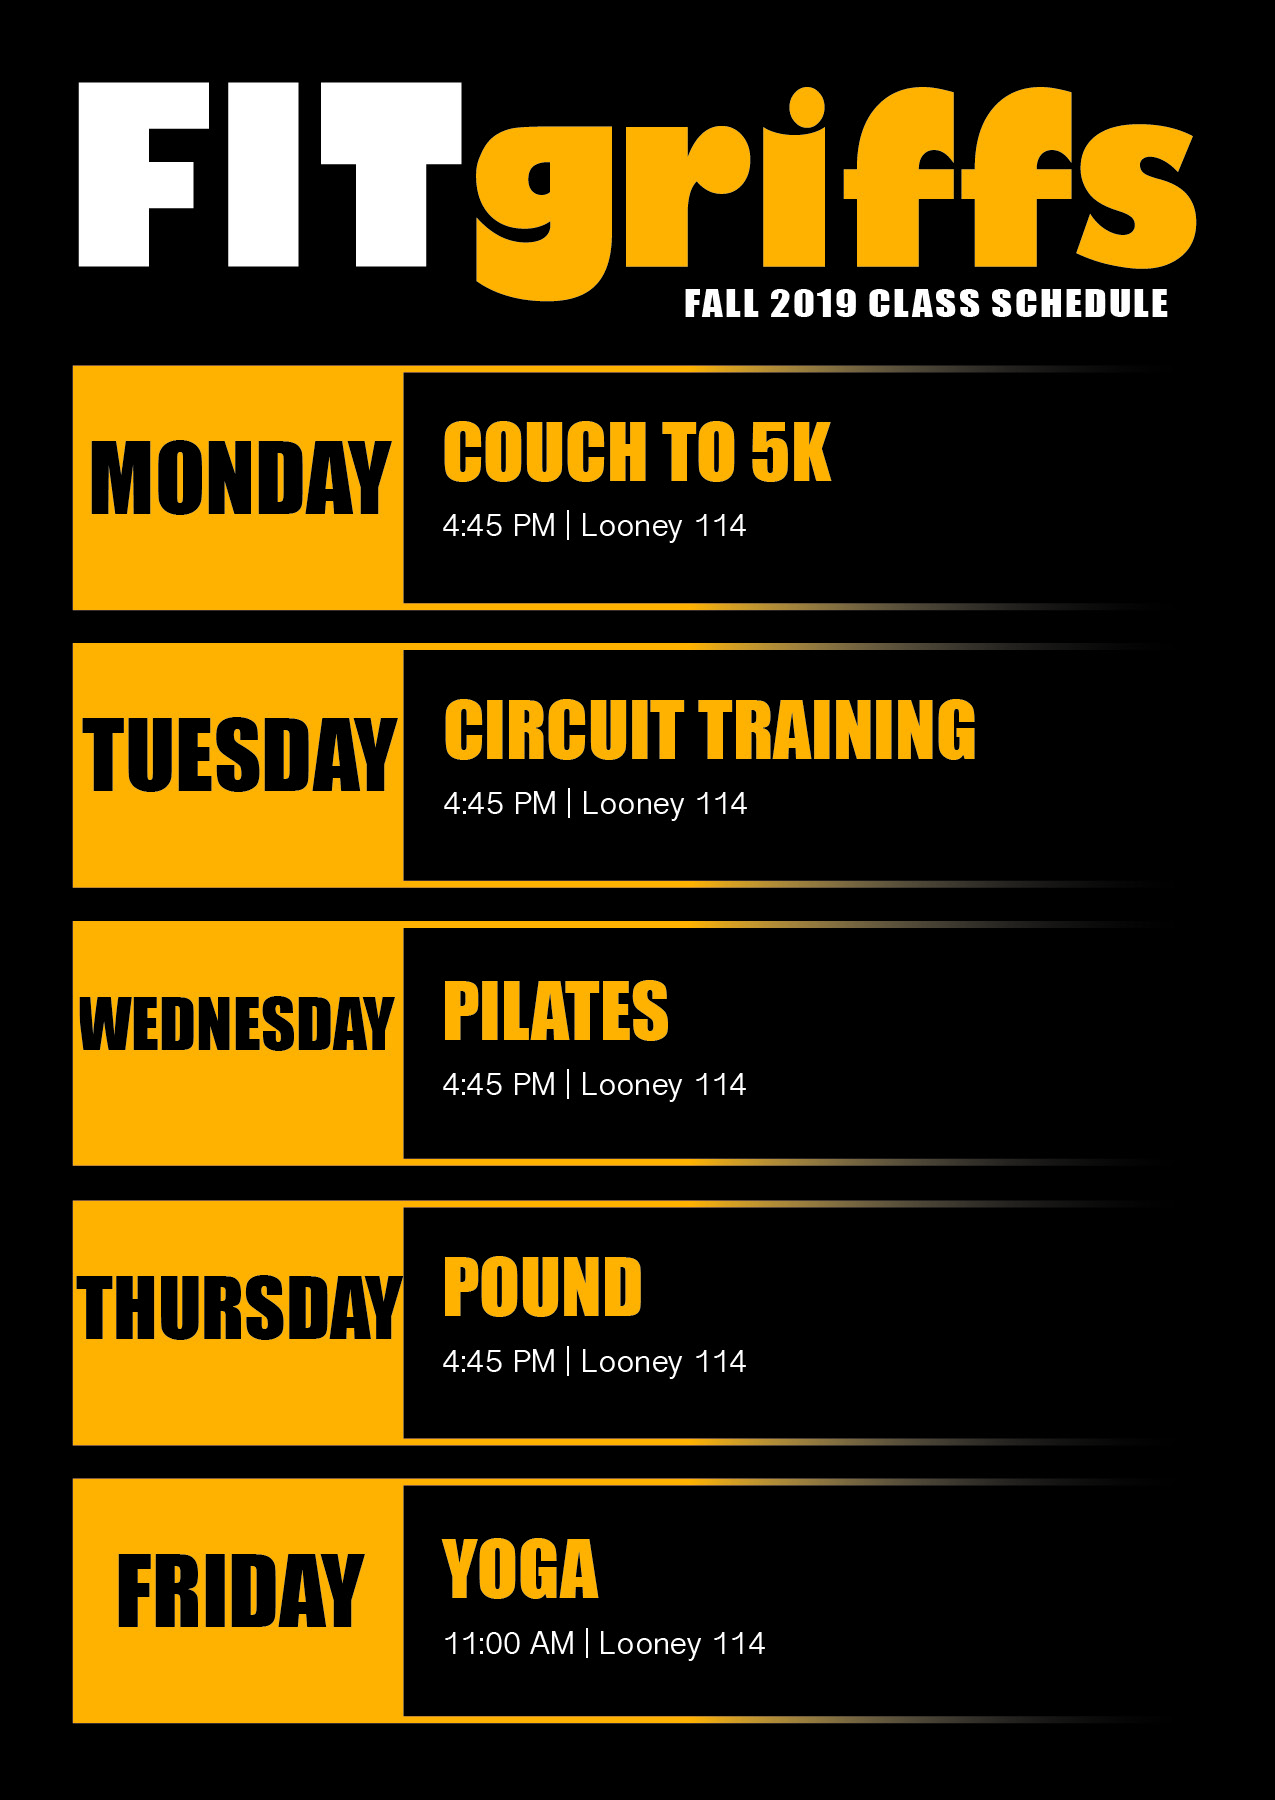 FITgriffs Fall 2019 Class Schedule